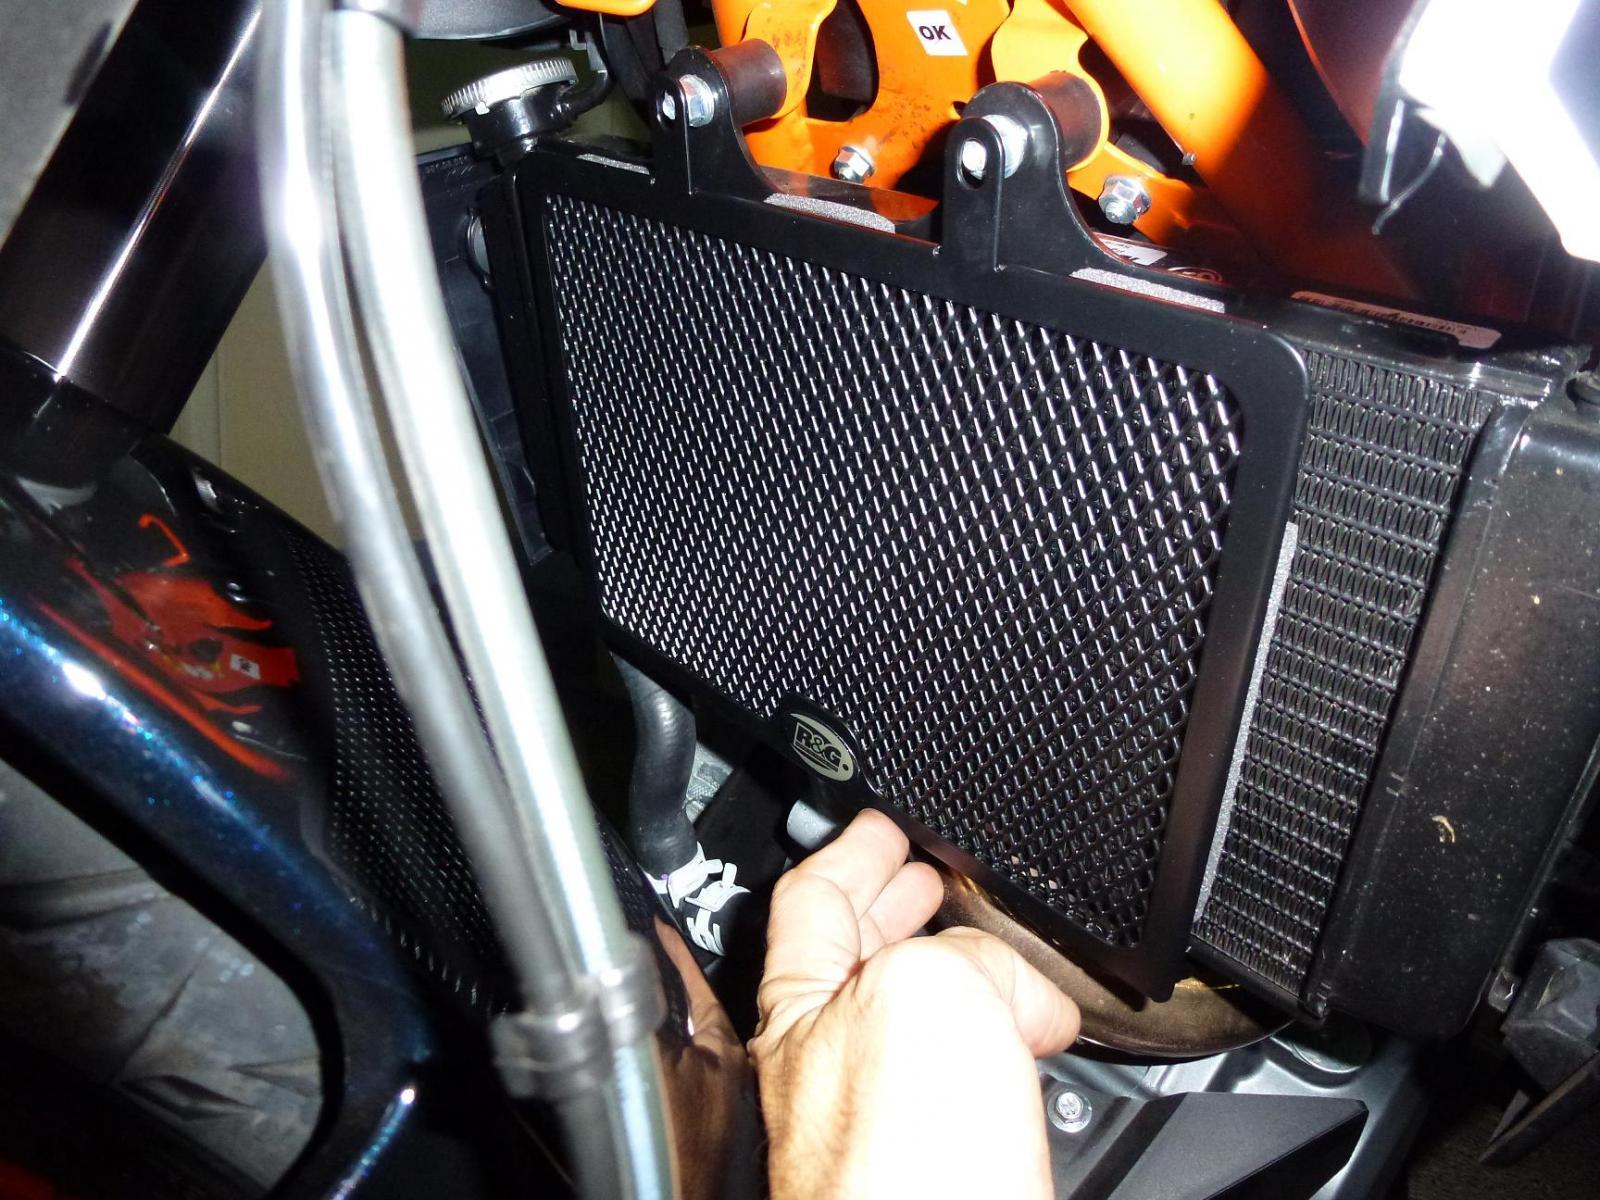 My Whip-r-g-radiator-guards-ktm-390-duke-003.jpg